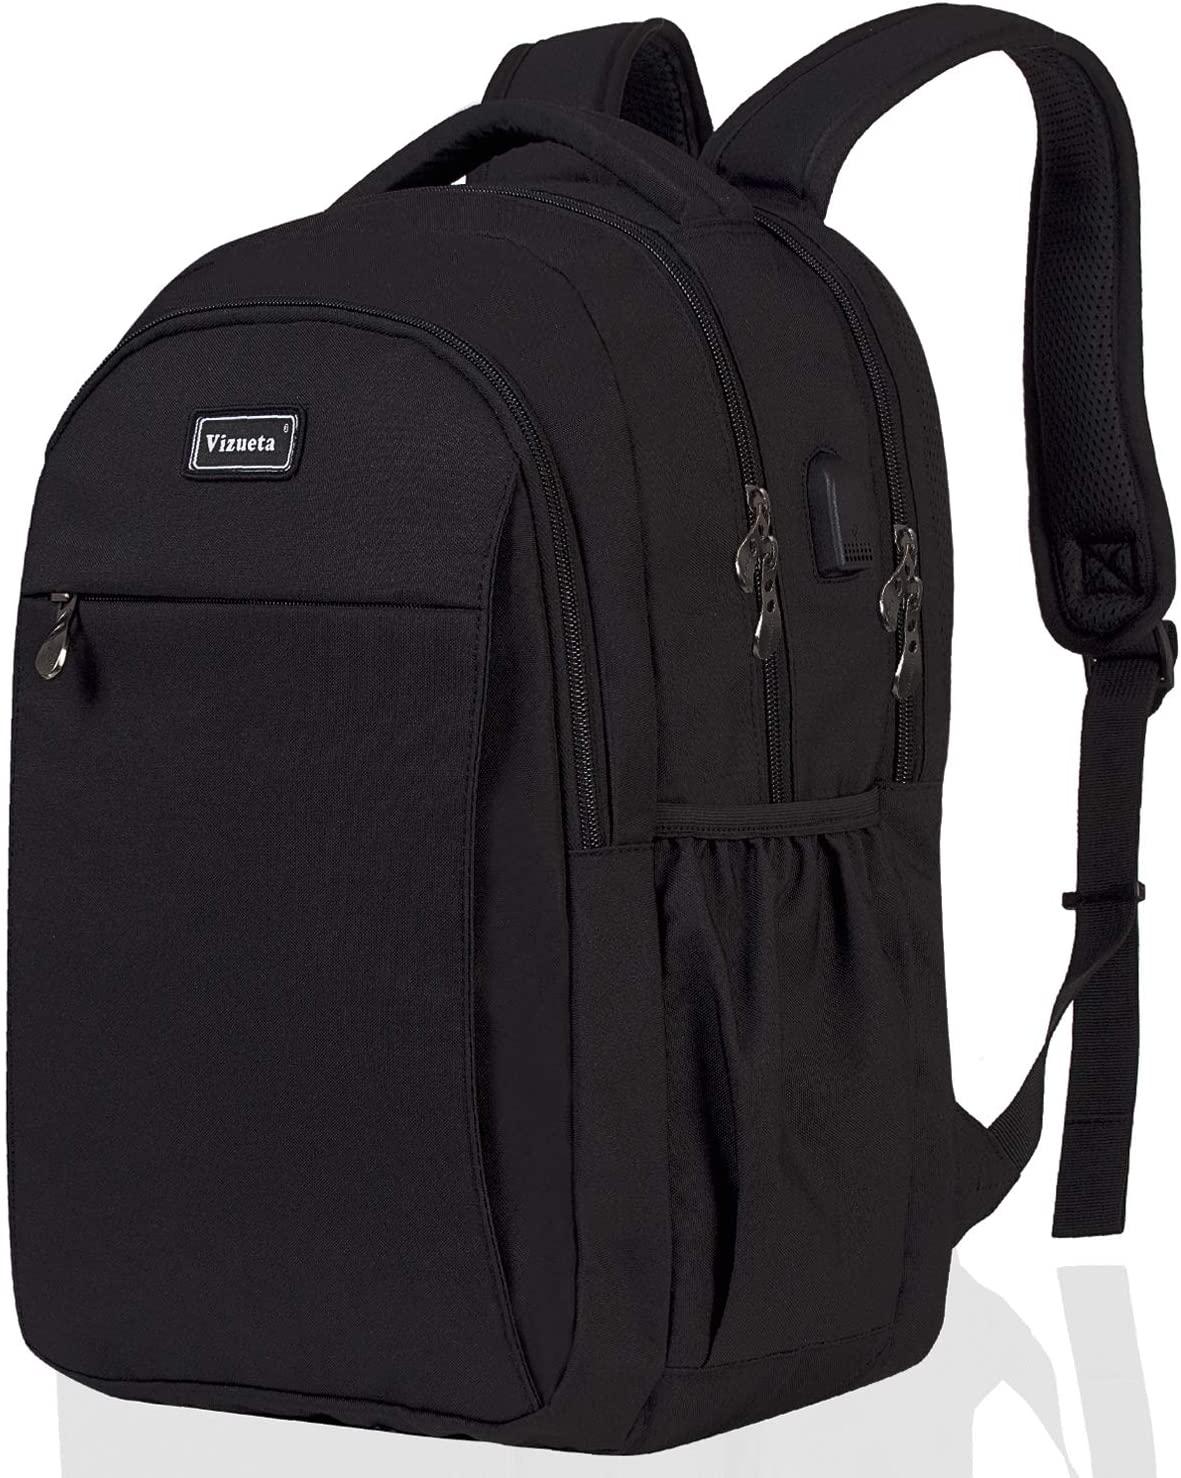 Laptop Computer Backpack Travel College School Backpack for Men Women Black